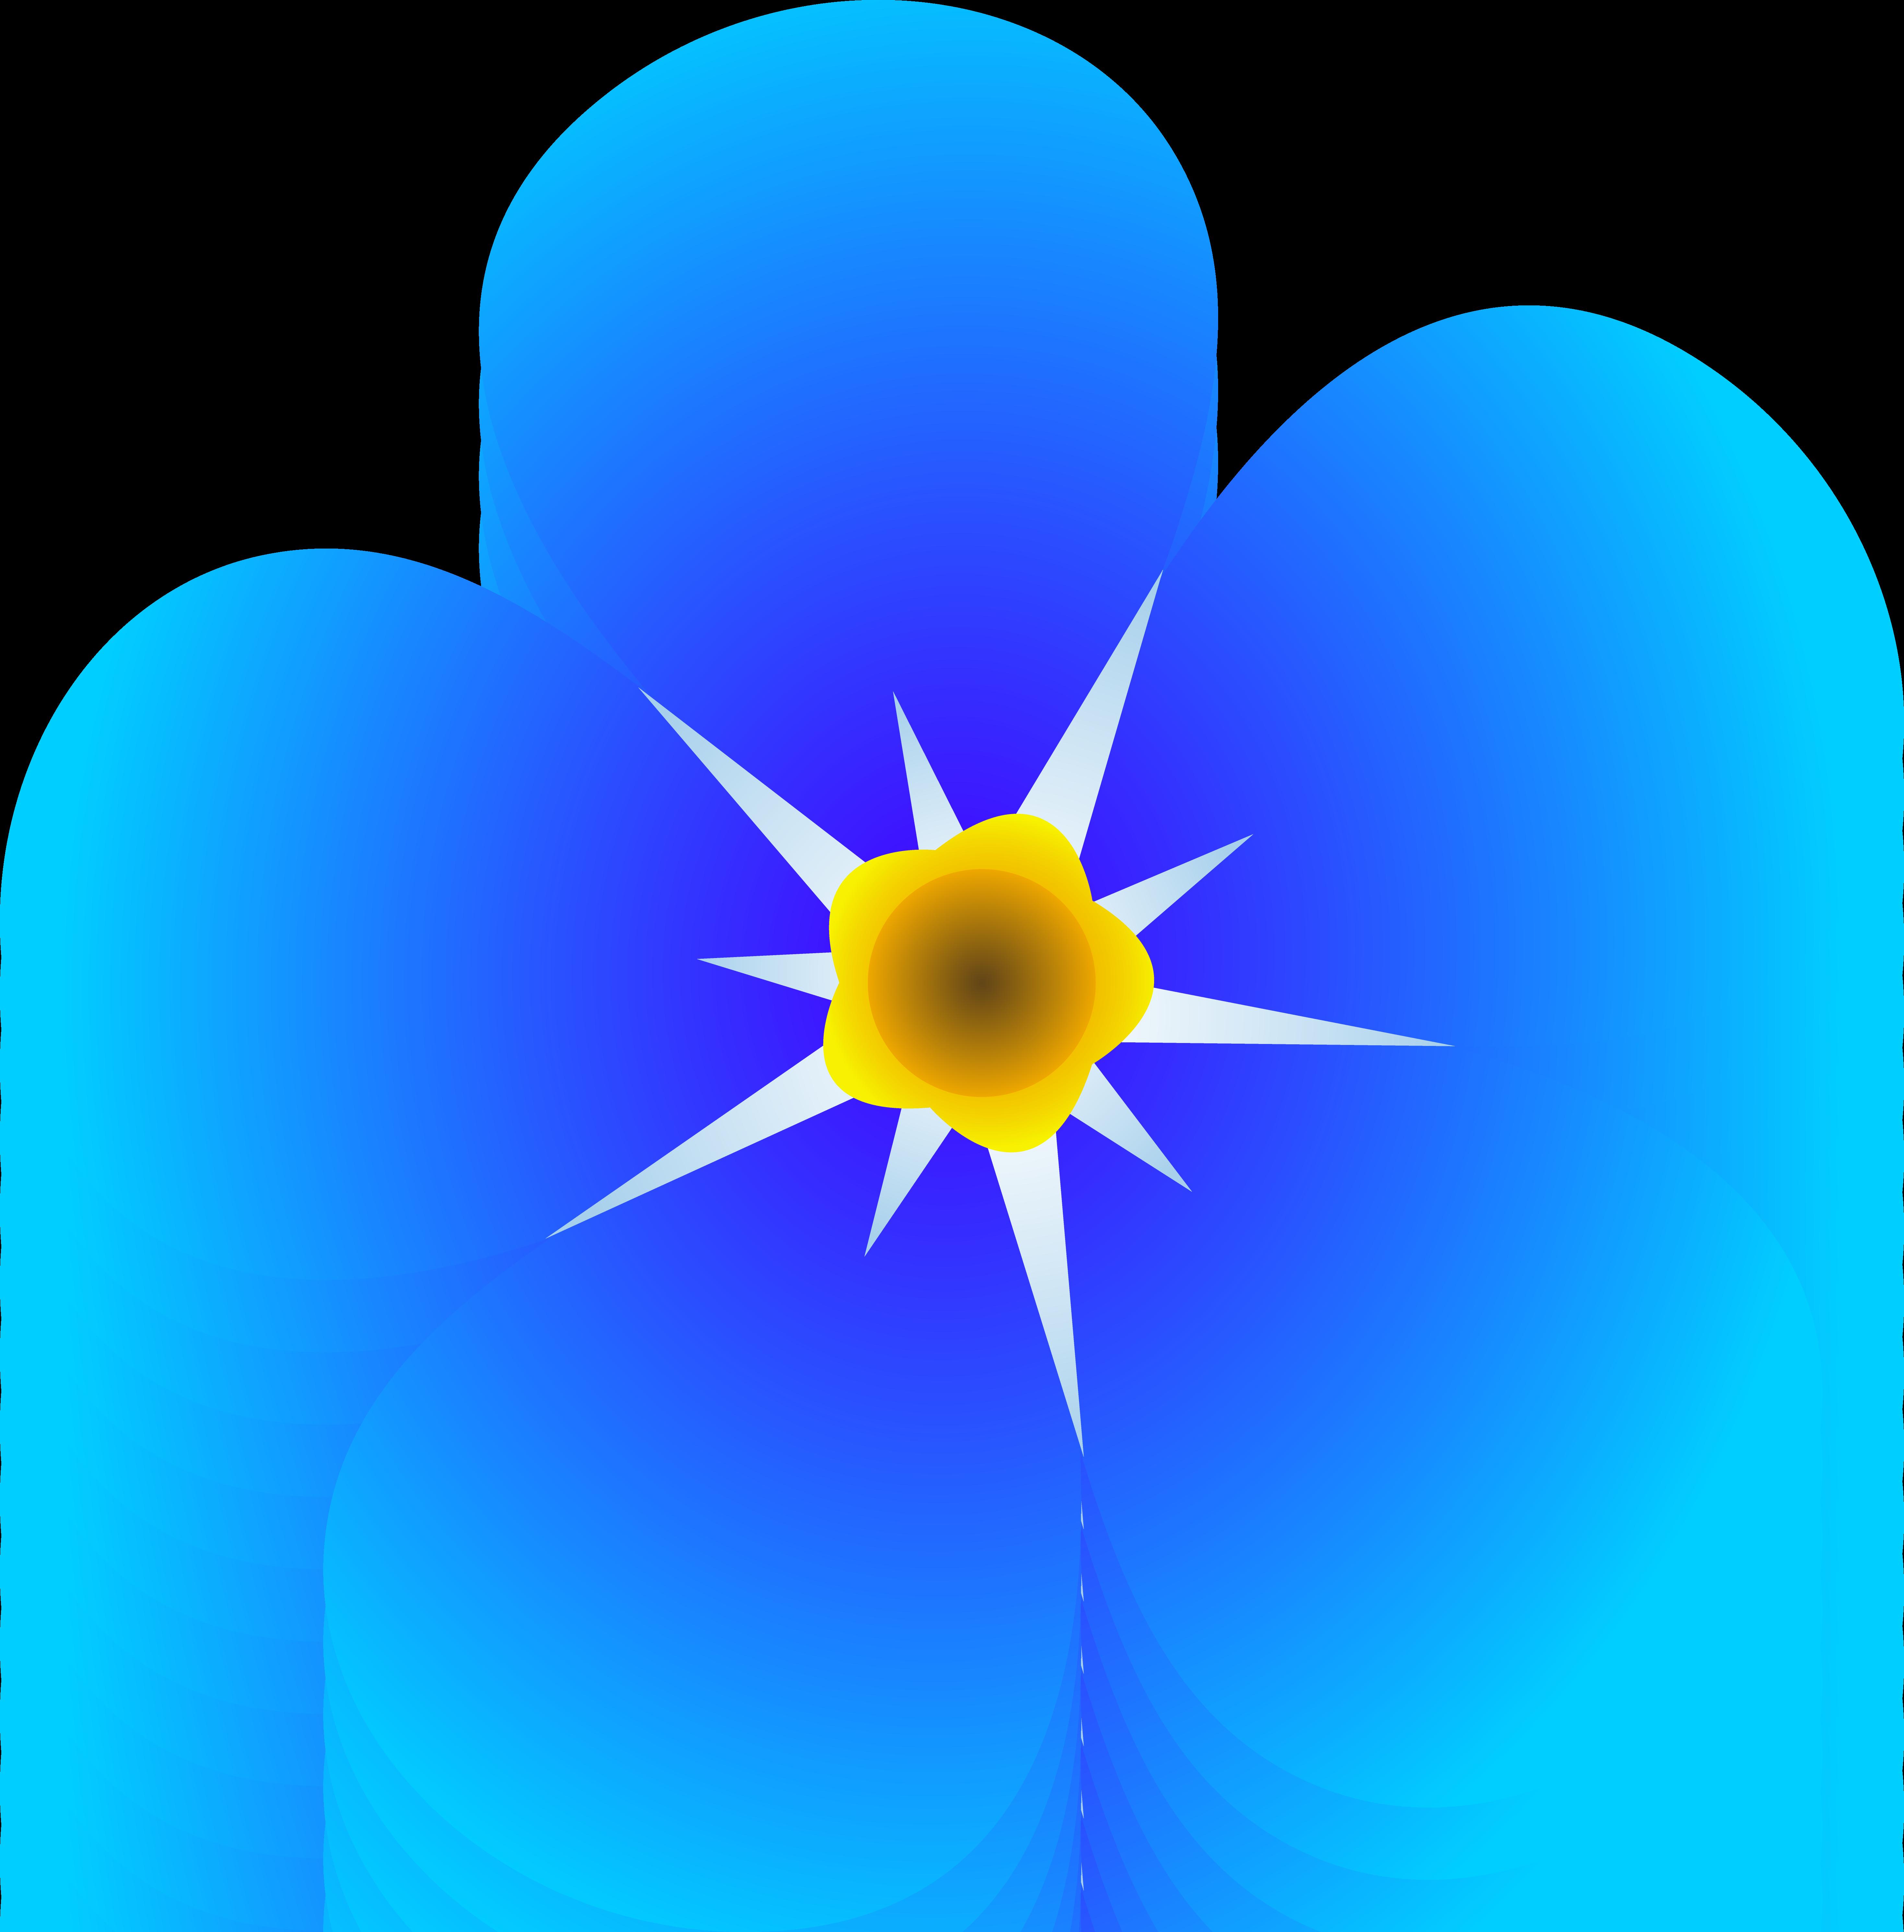 Flowers For Blue Flowers Clip Art-Flowers For Blue Flowers Clip Art-10